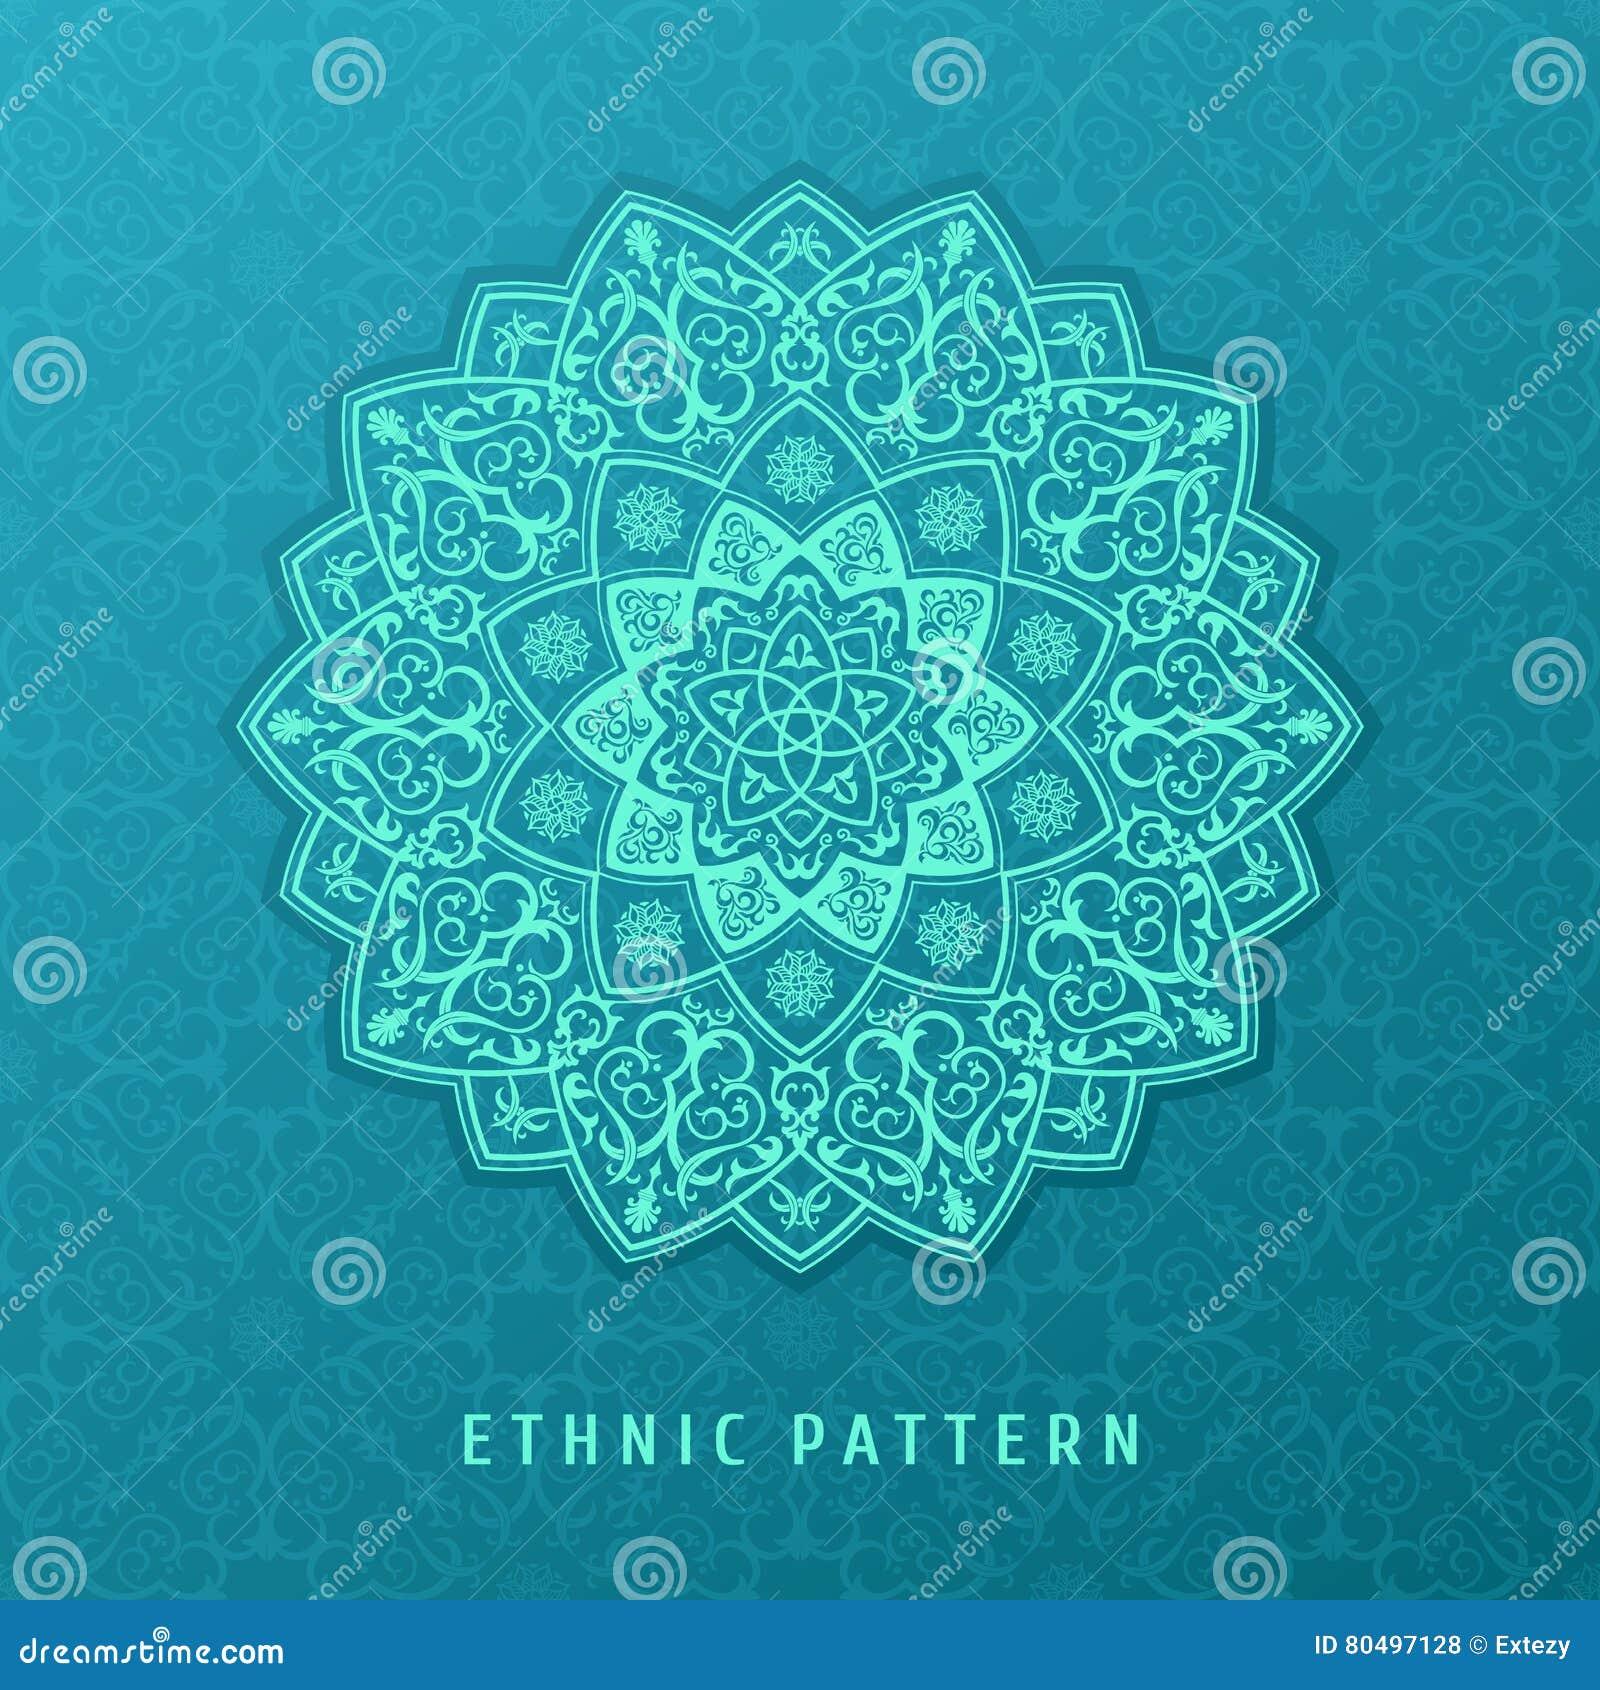 ethnic vector pattern mandala design for invitations cards labels